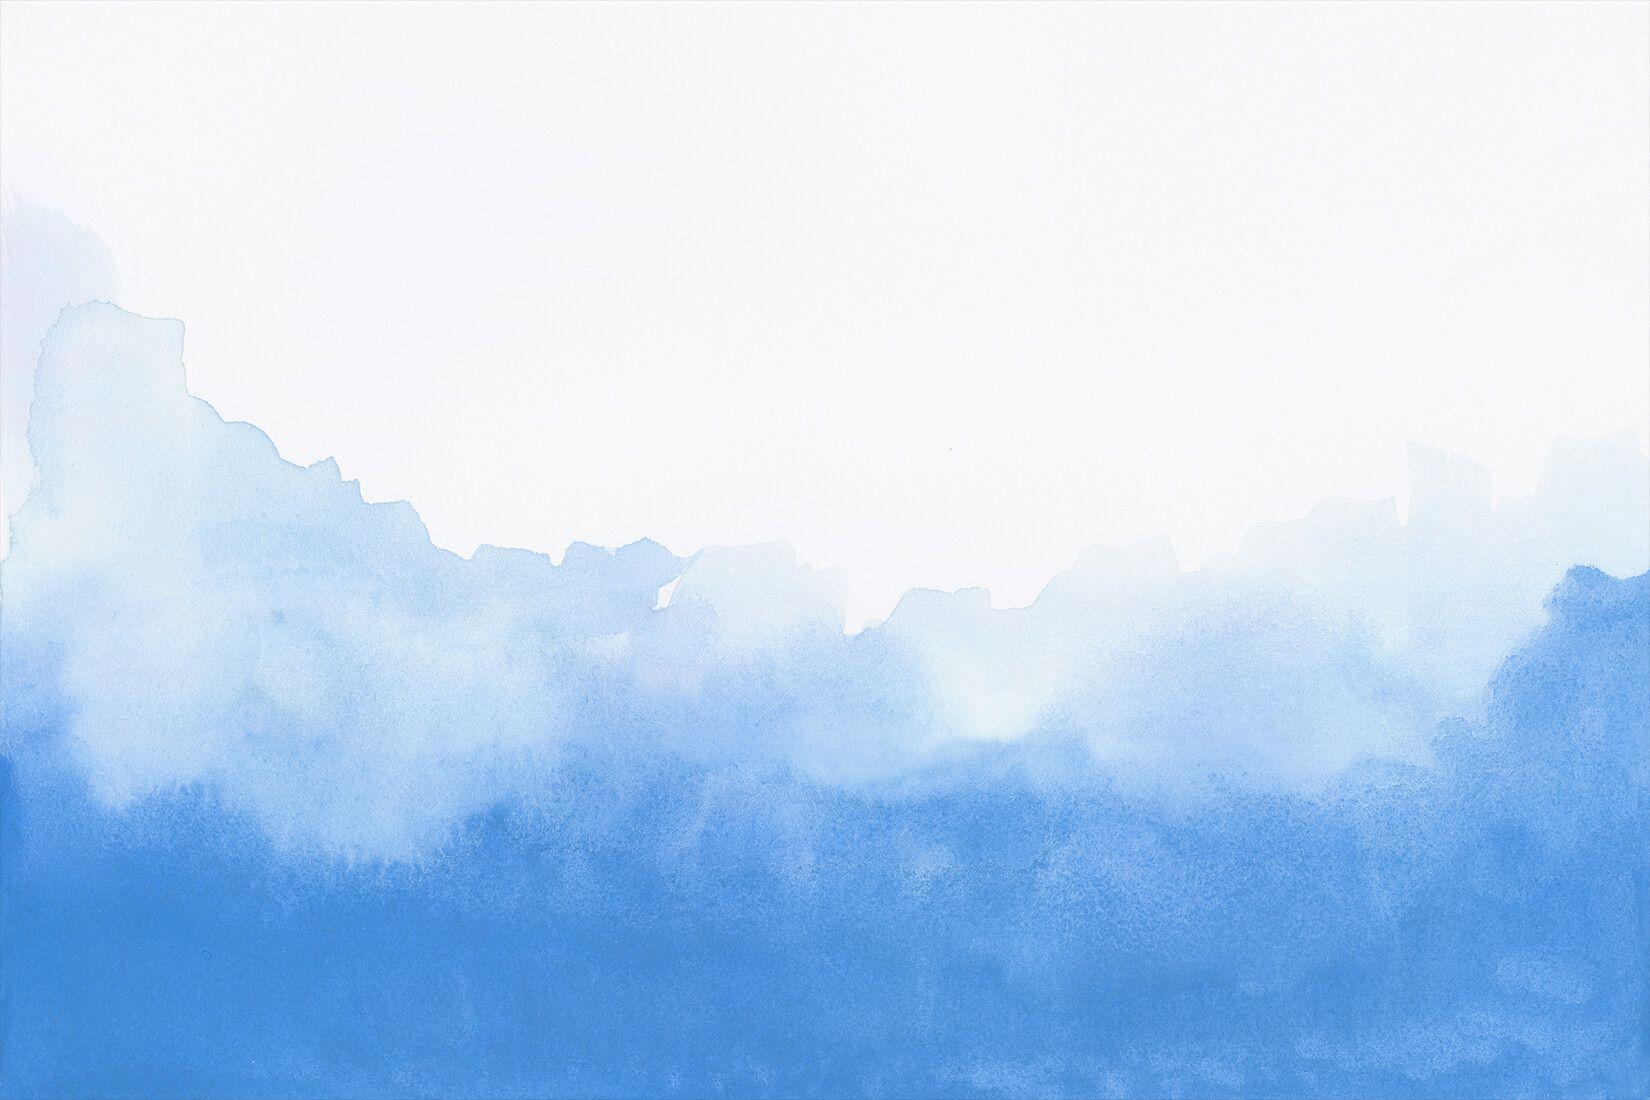 Blue Blend Watercolour Wall Mural Blue marble wallpaper